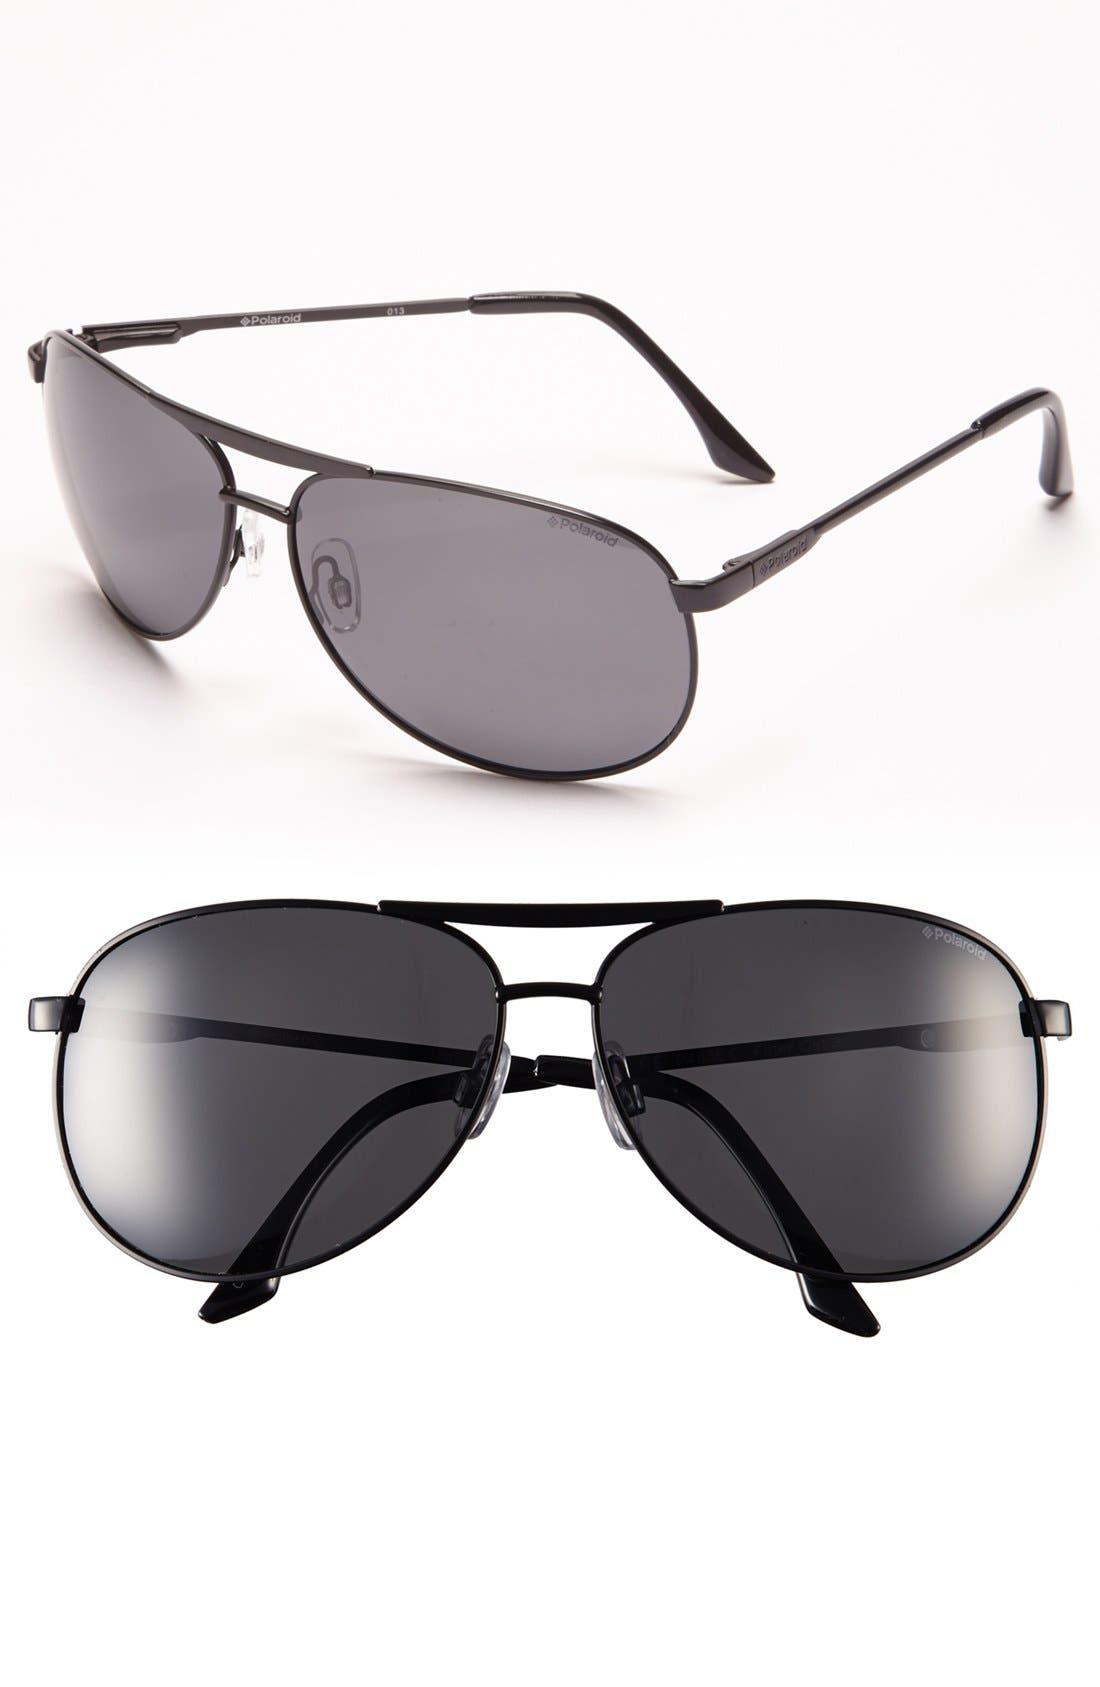 Alternate Image 1 Selected - Polaroid Eyewear 68mm Polarized Metal Aviator Sunglasses